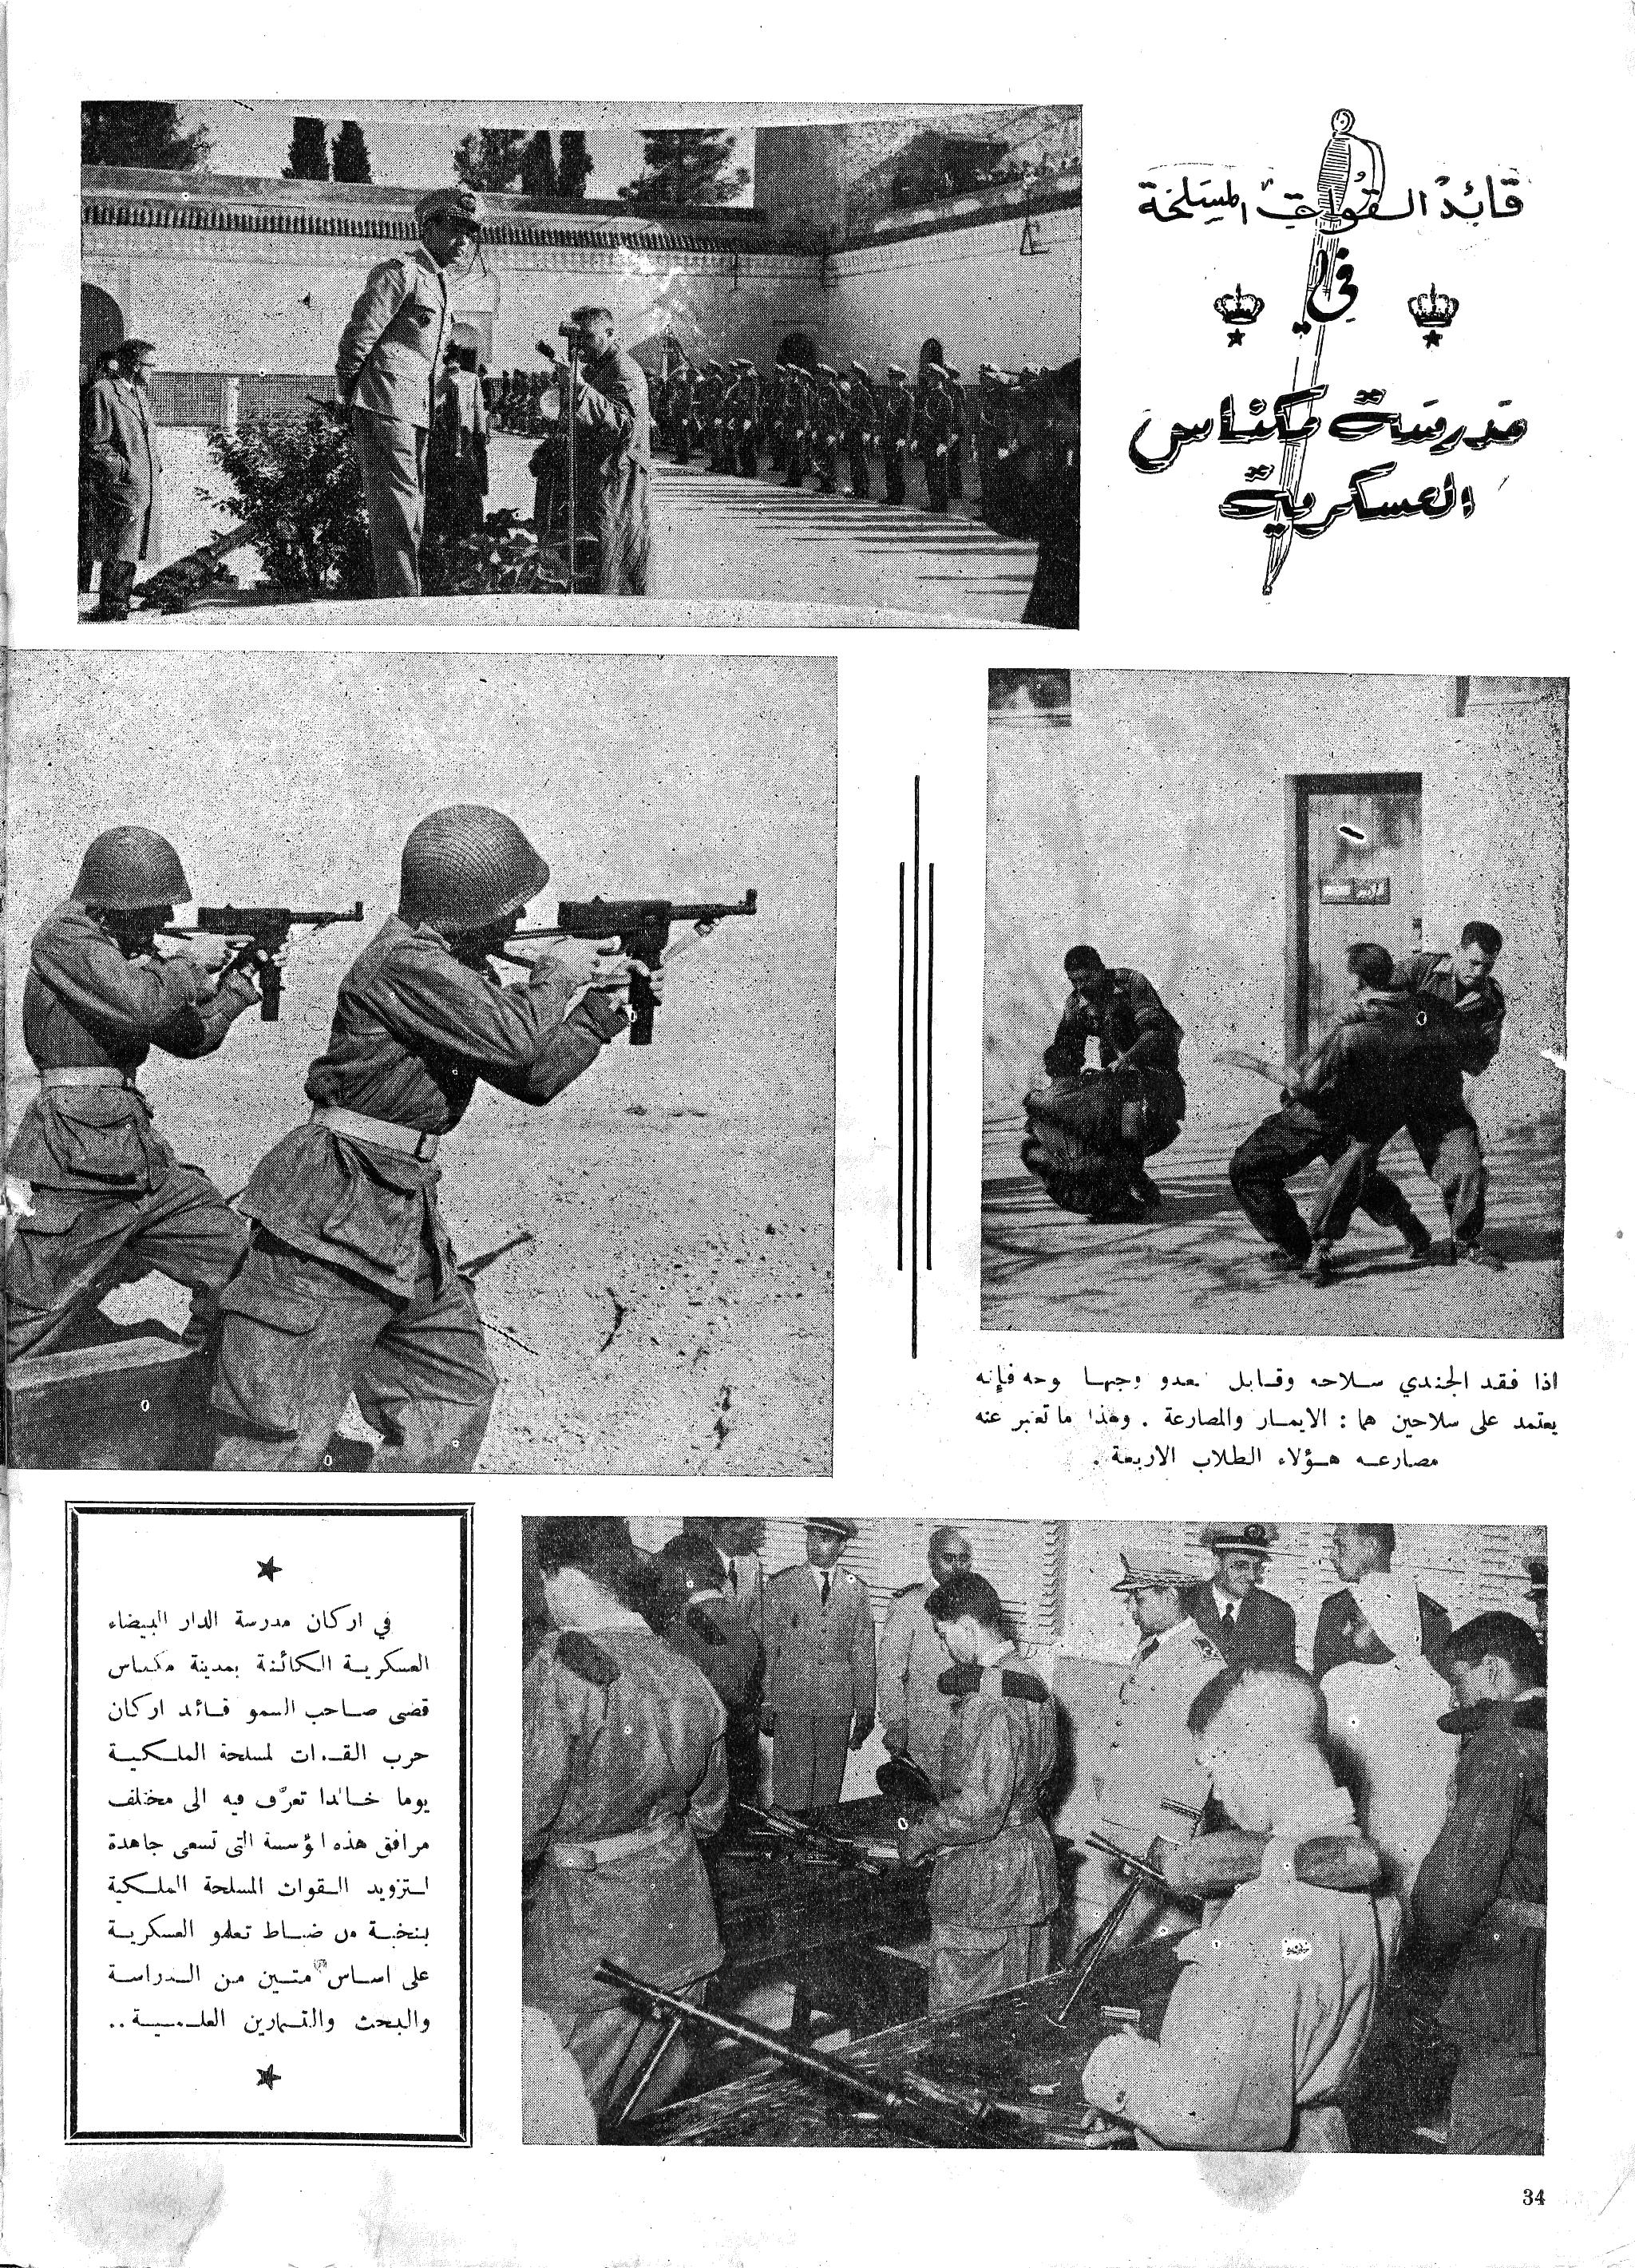 22/12/1956 - Visite du prince héritier Moulay Hassan à l'ARM 48757850442_f2ca55e8dd_o